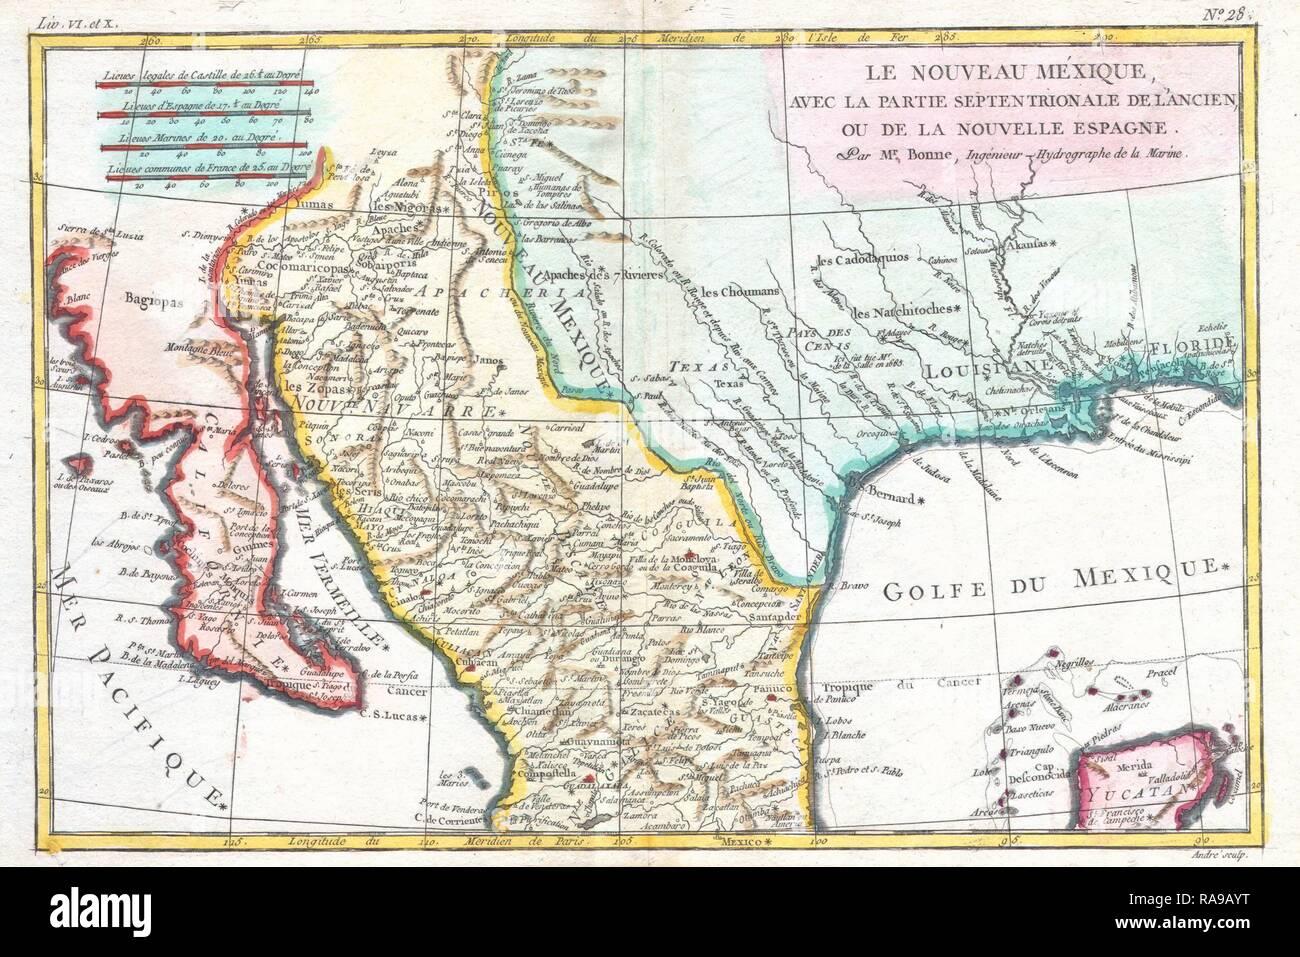 1780 Bonne Map Of Texas Louisiana And New Mexico Rigobert Bonne